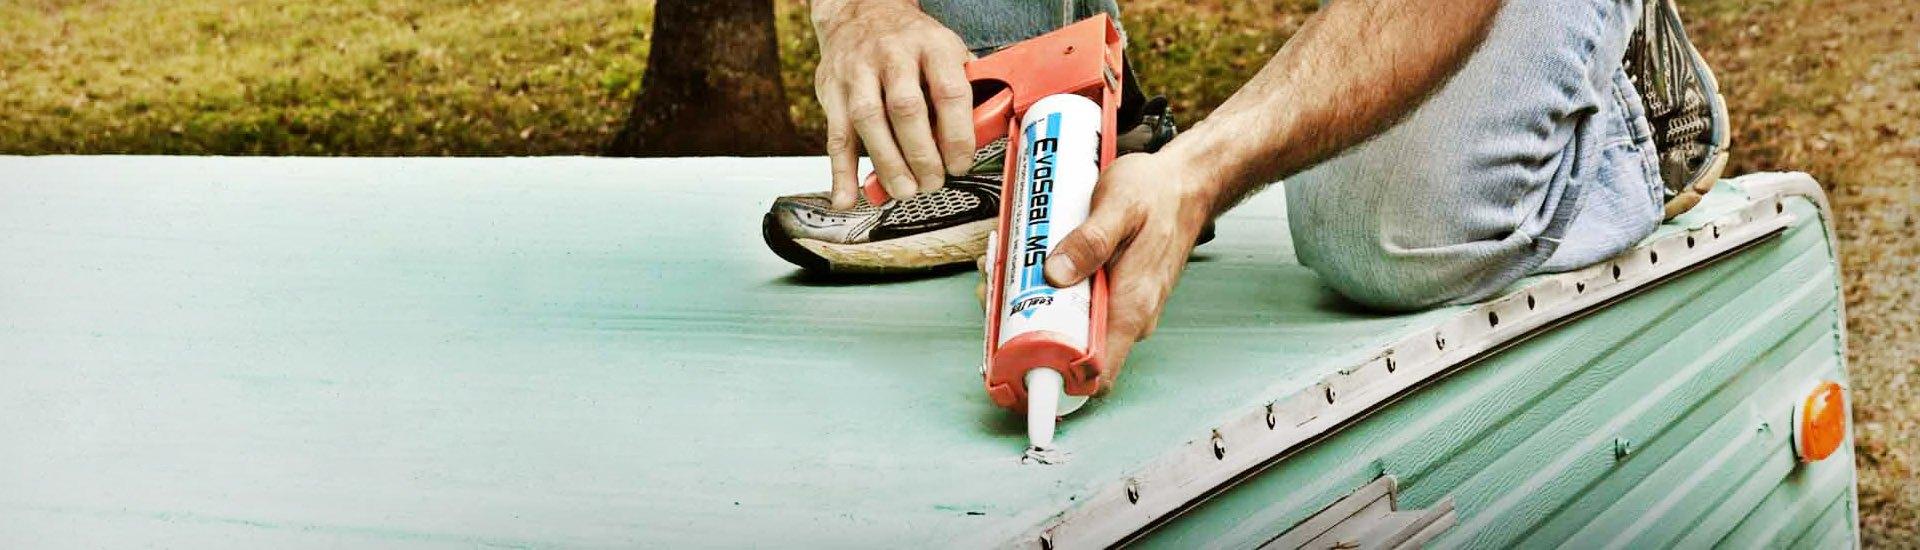 RV Roofing & Sealants | Tapes, Coatings, Repair Kits